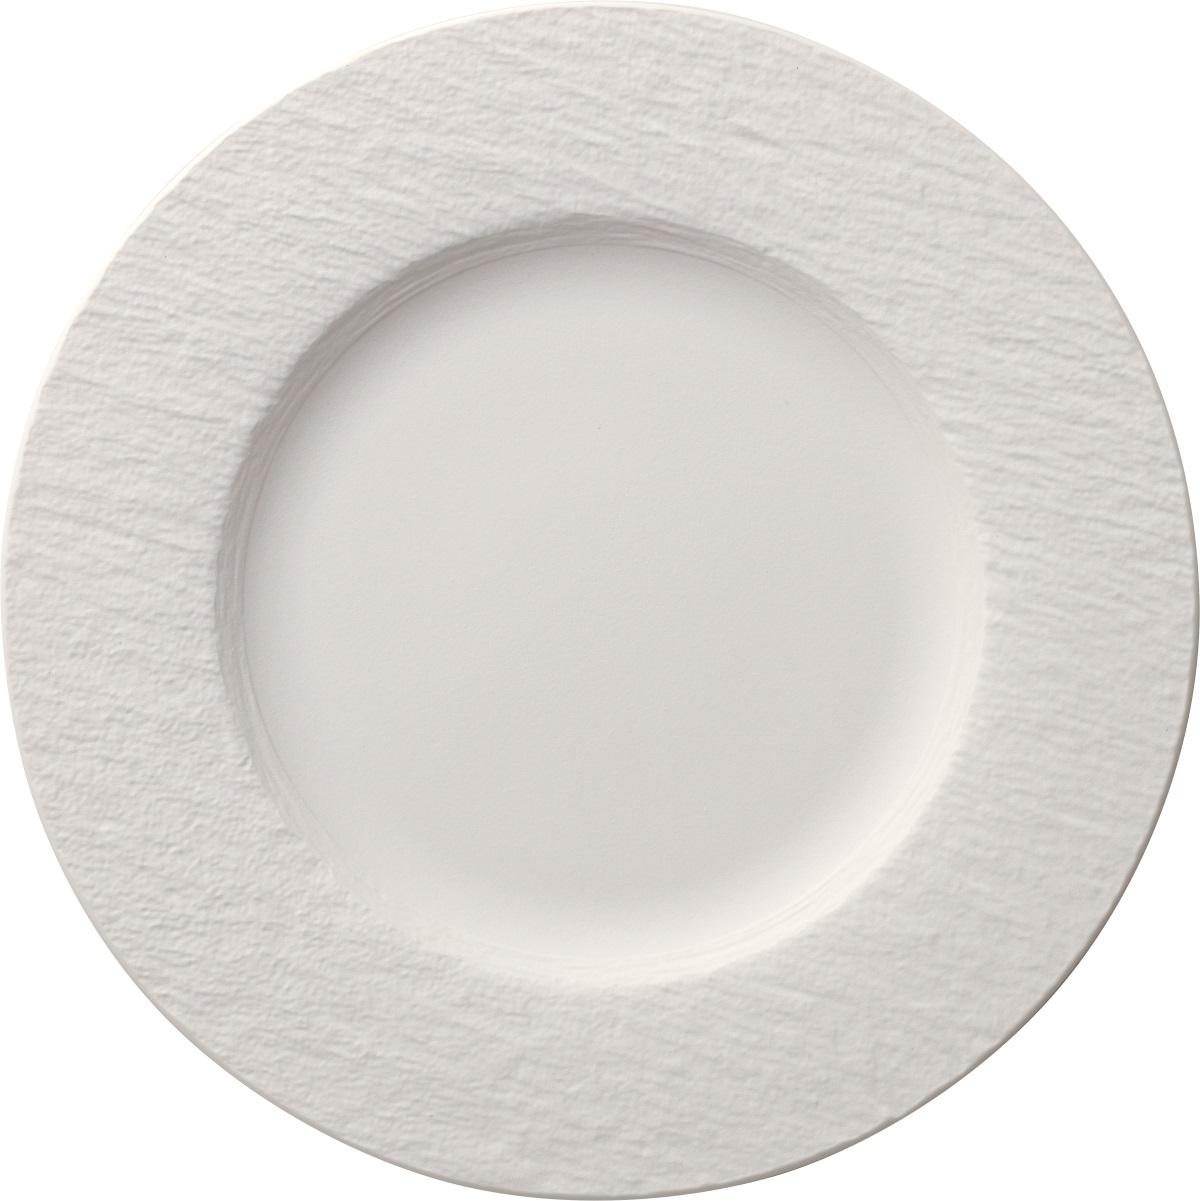 Farfurie plata Villeroy & Boch Manufacture Rock Blanc 27cm poza